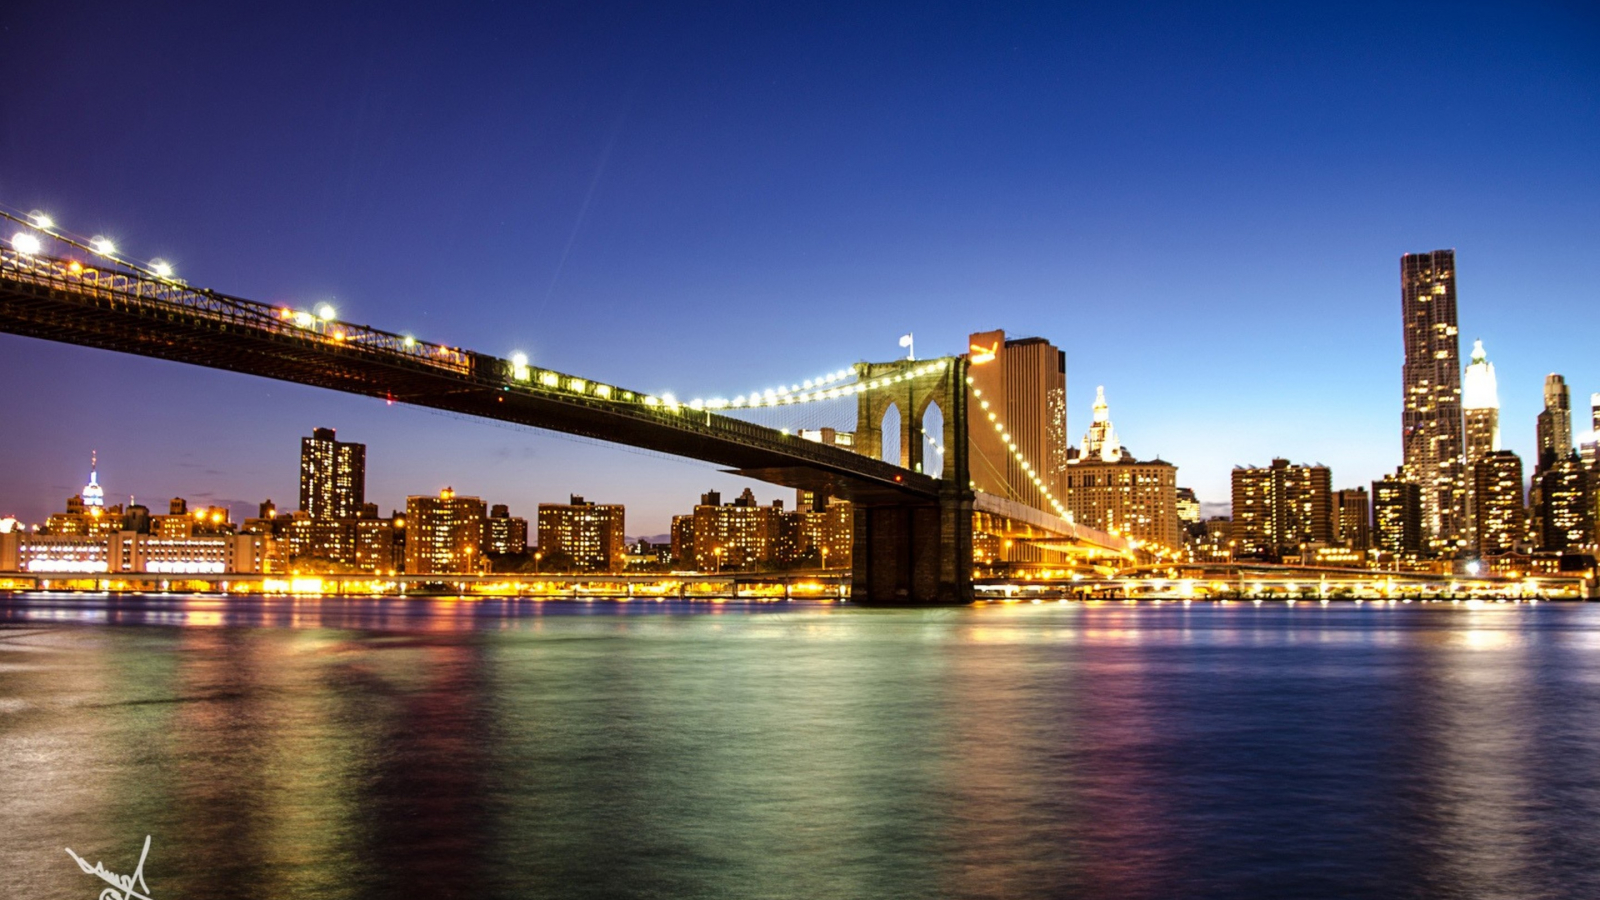 Free Download 2880x1800 Brooklyn Bridge In New York Macbook